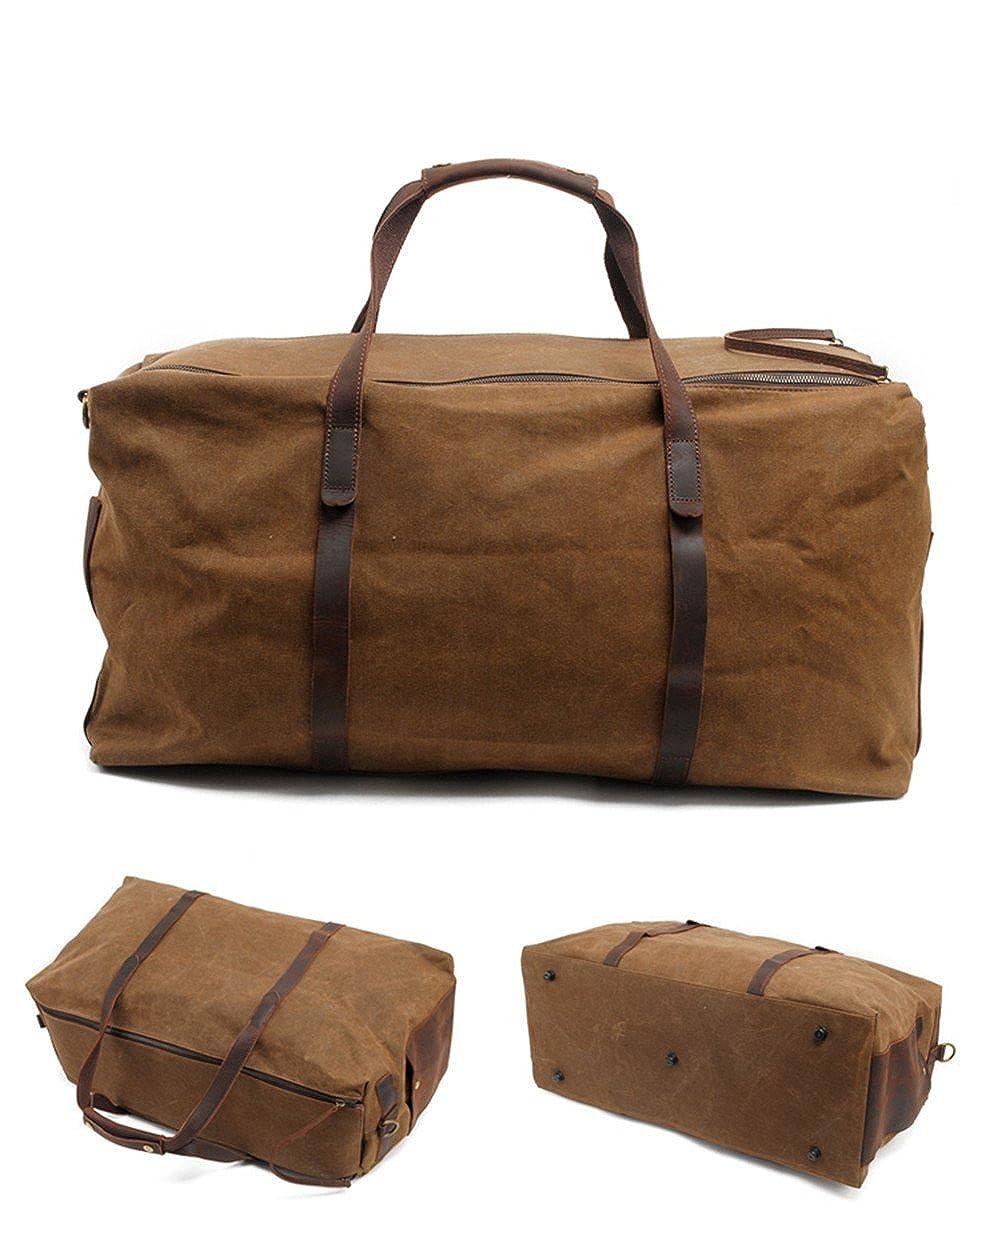 Genda 2Archer Oversized Canvas Travel Tote Duffel Shoulder Handbag Weekend Bag